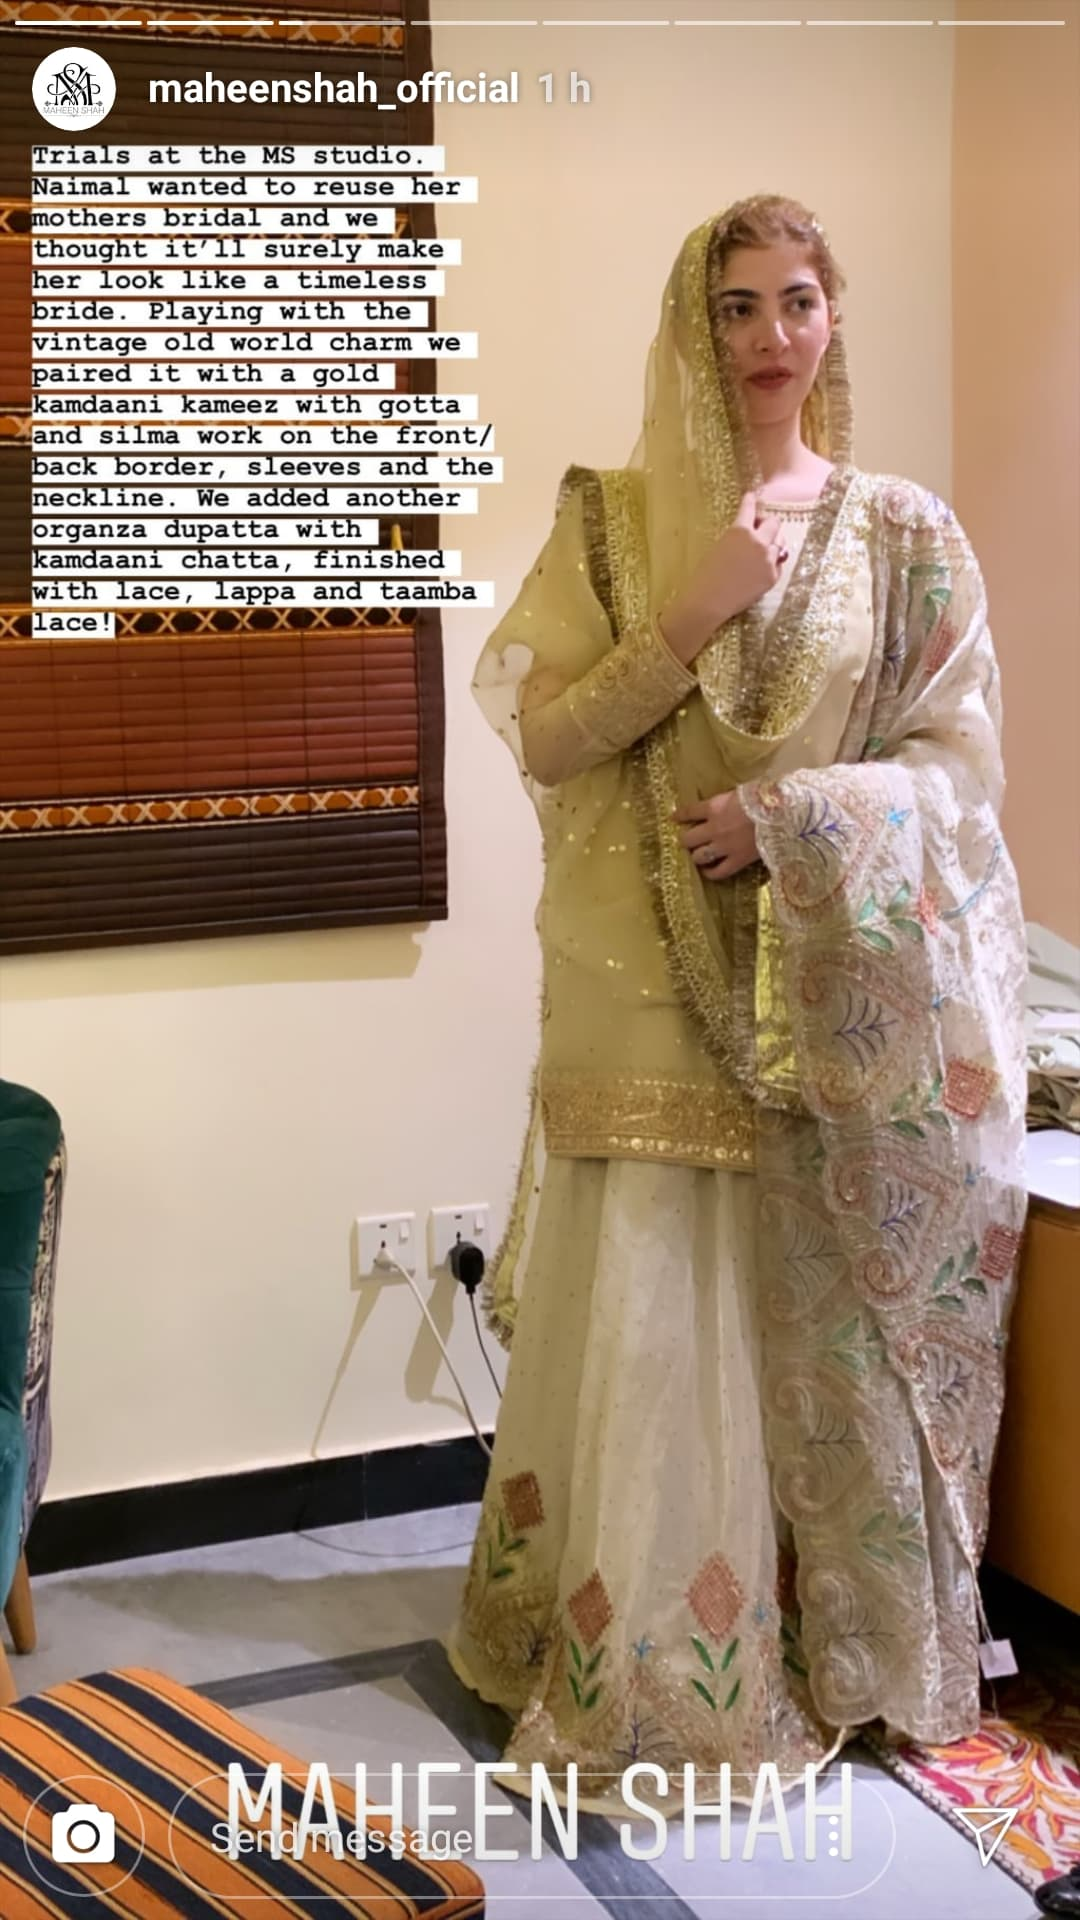 Naimal Khawar Wears Maheen Shah on Her Nikkah | Reviewit pk